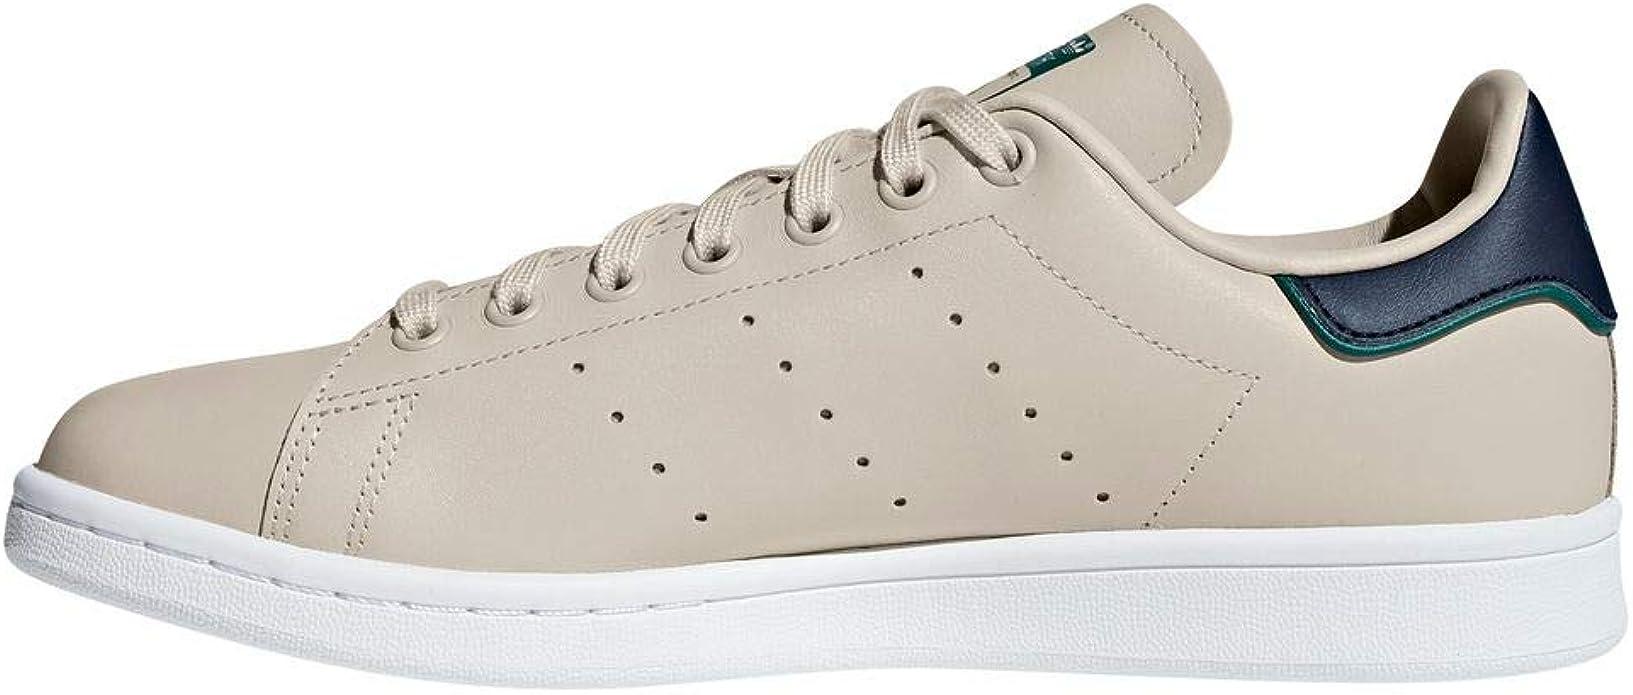 adidas Stan Smith Sneakers Beige Homme Originals : Amazon.fr ...